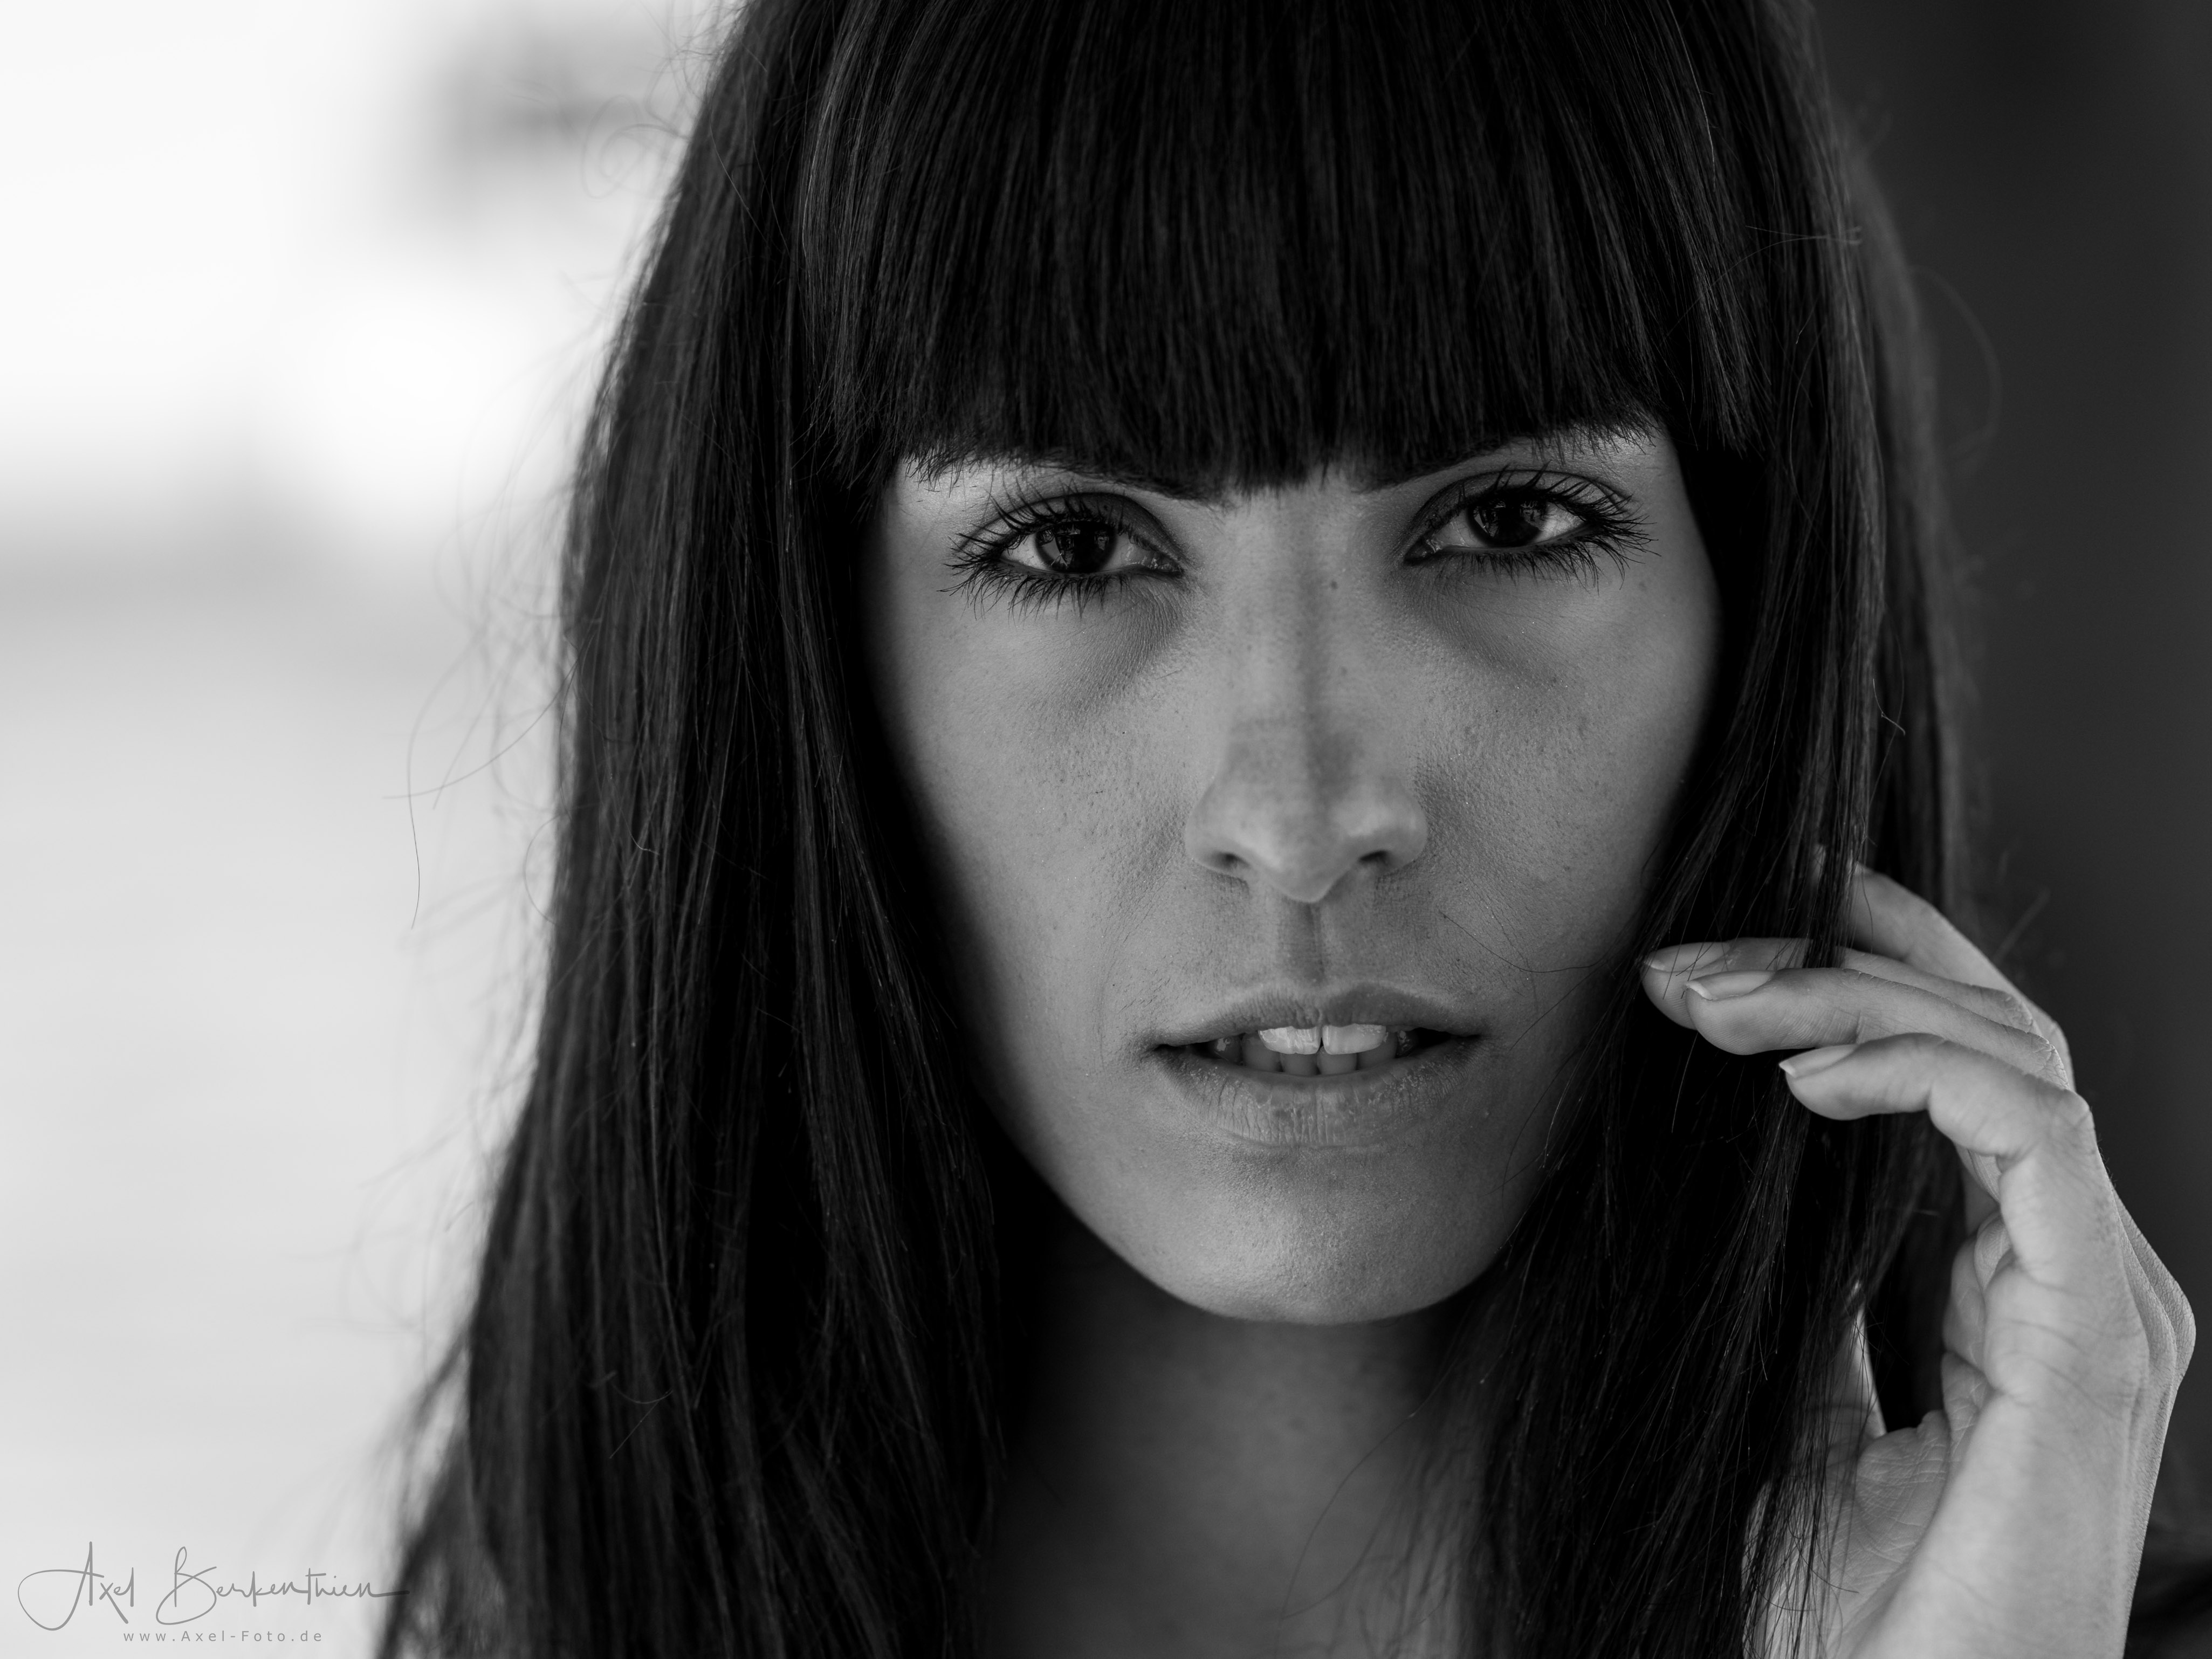 Jacqueline Scherer - Axel.Photography